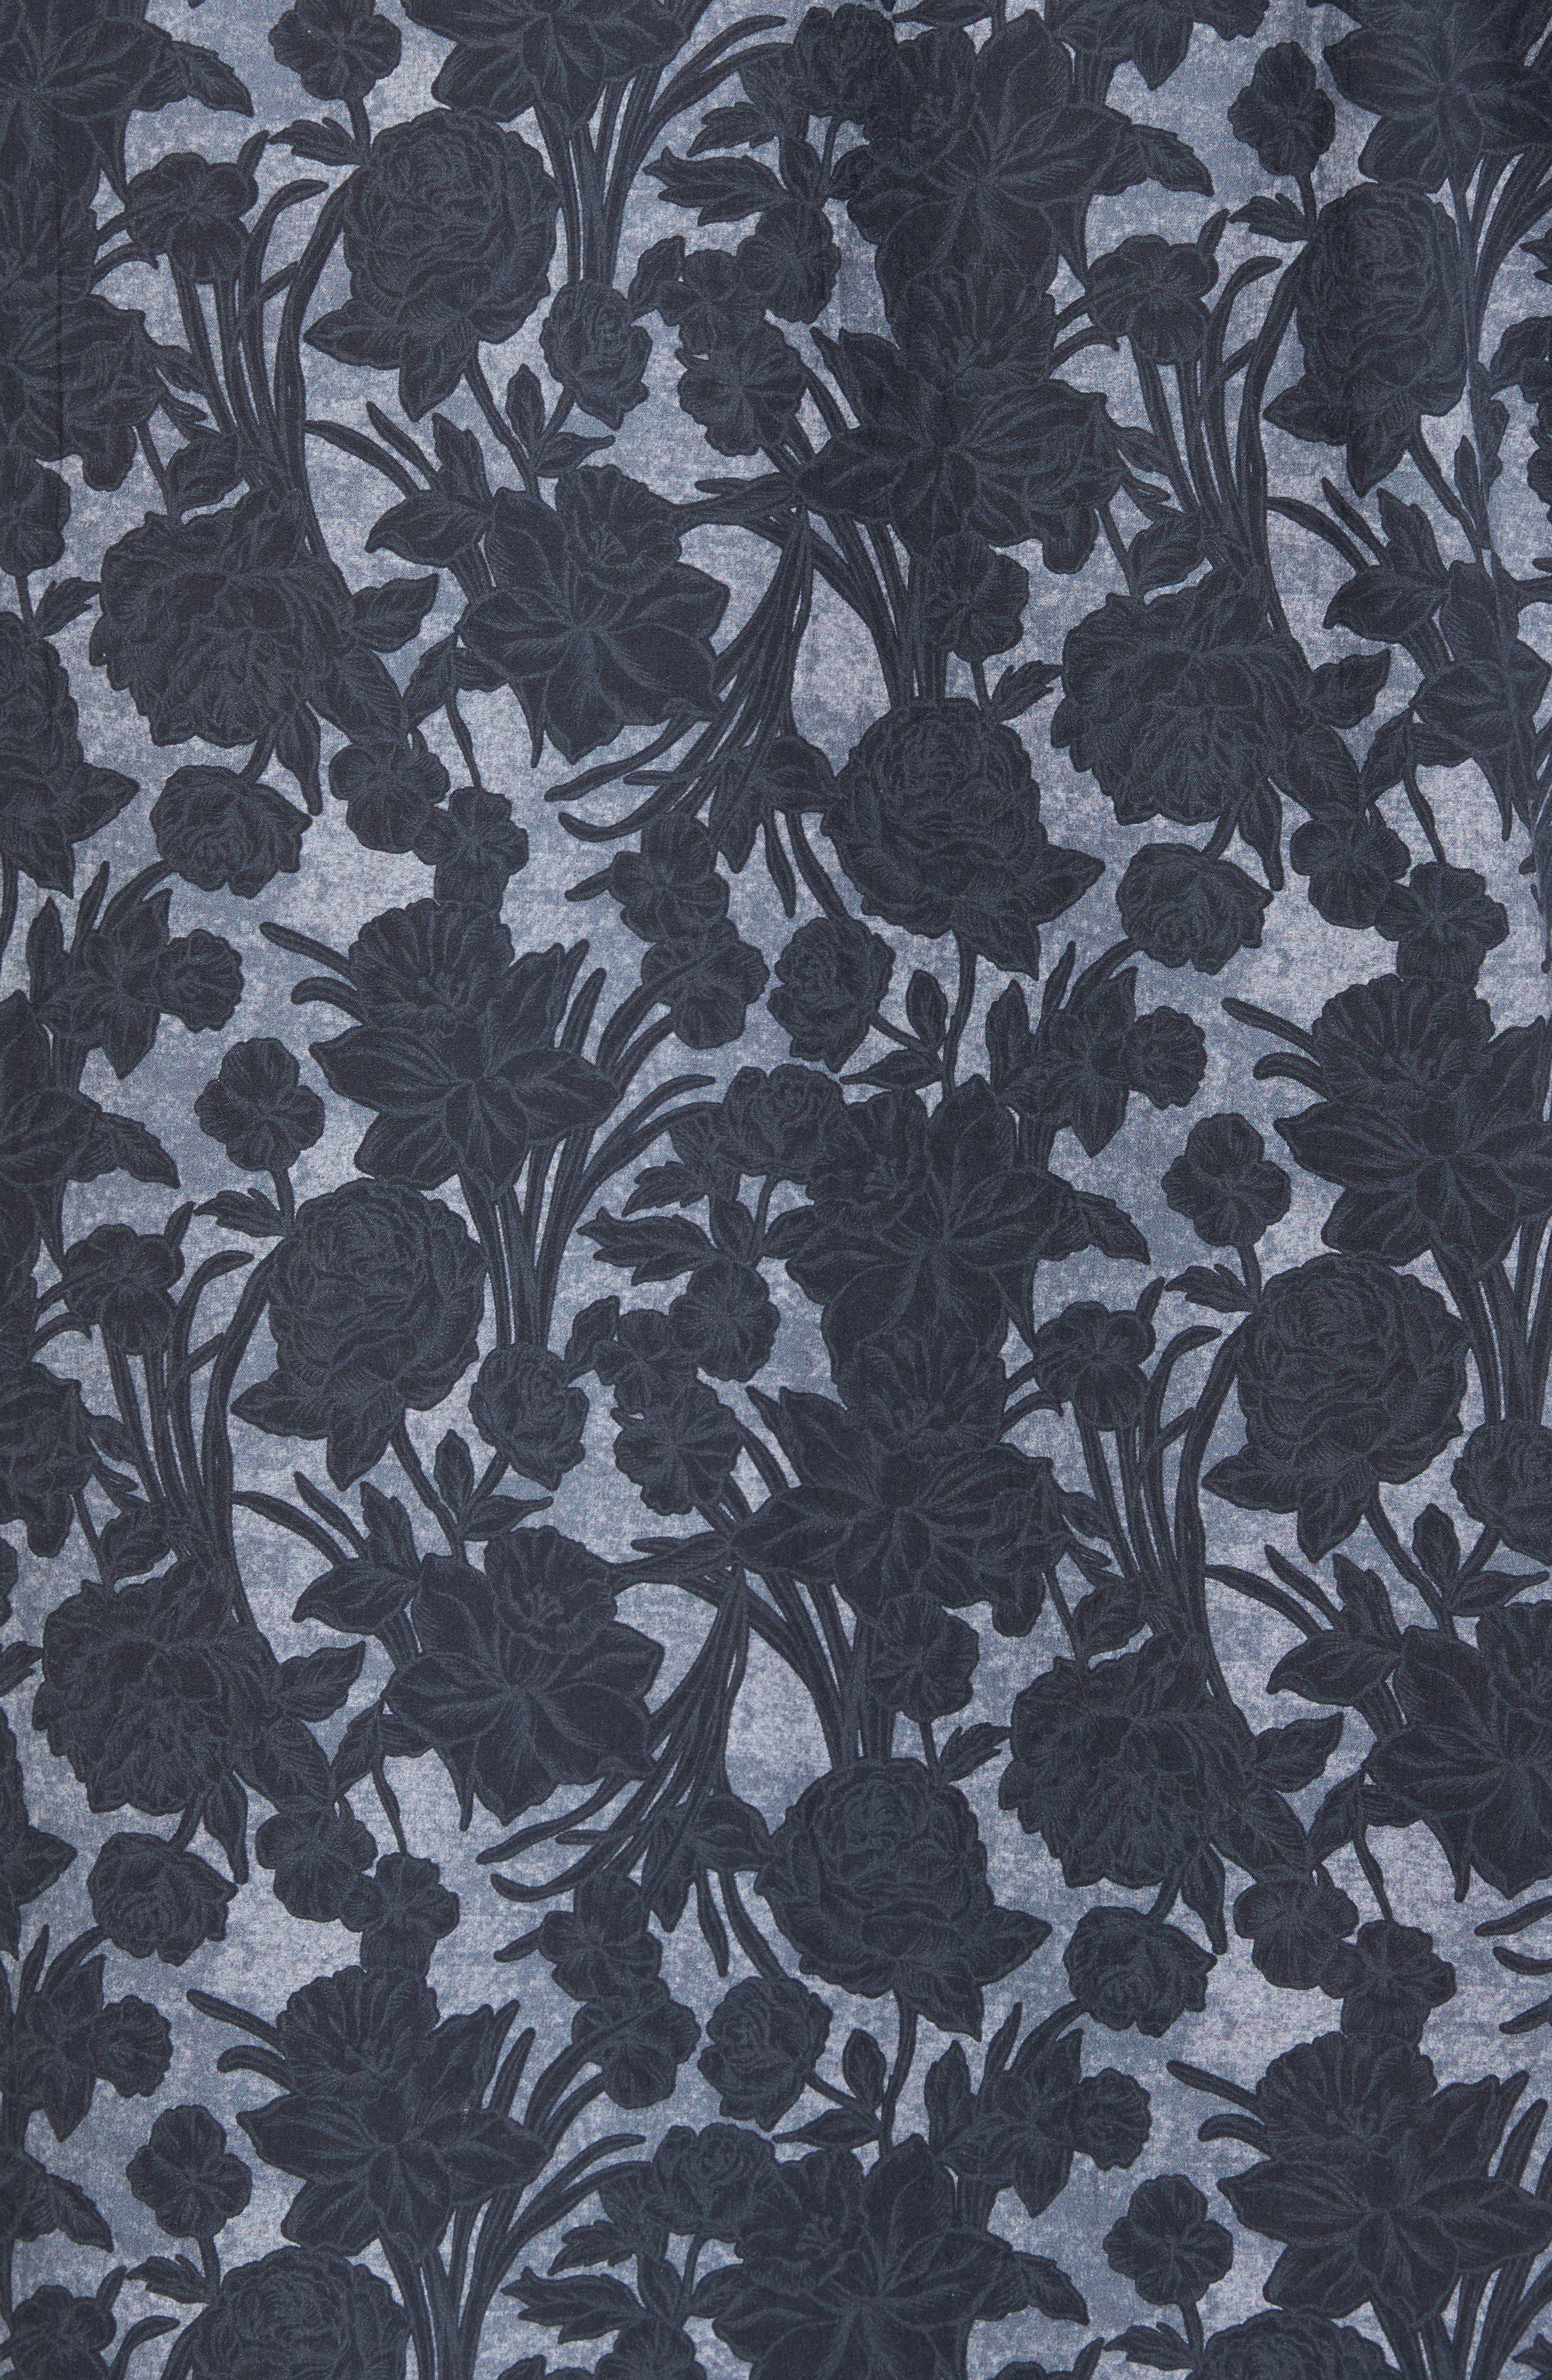 Sunday Woven Shirt,                             Alternate thumbnail 5, color,                             001